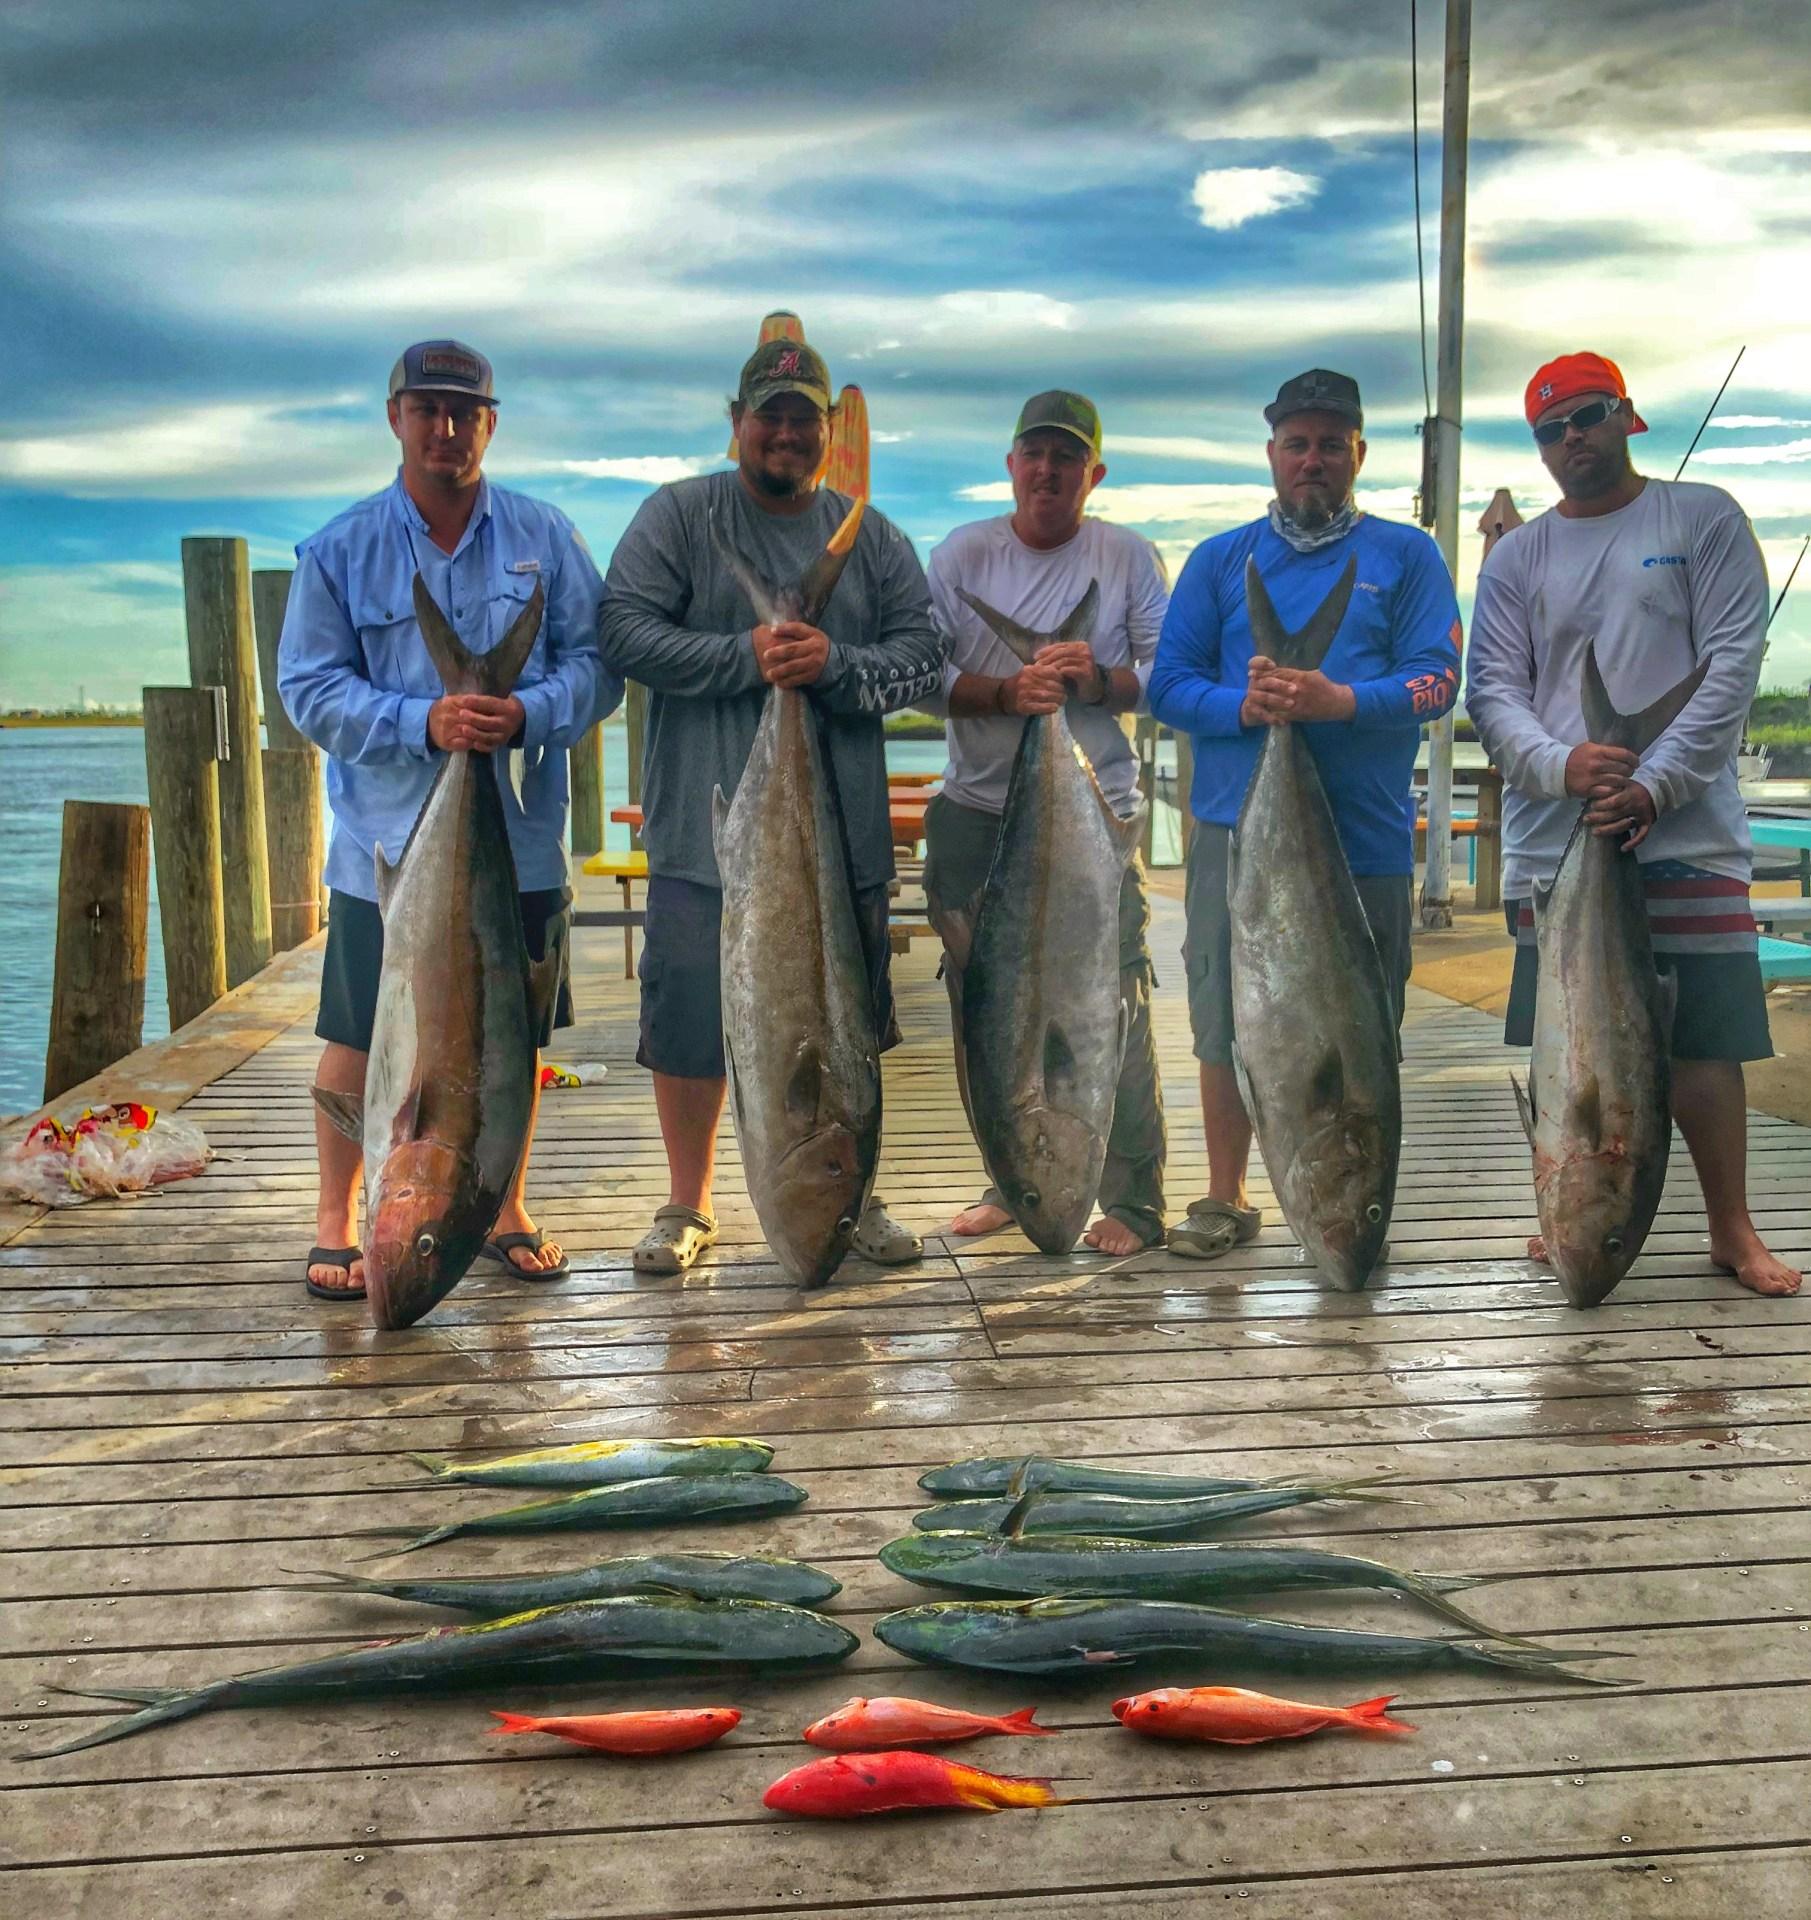 deep-sea-fishing-charter-big-amberjack-fish-2018